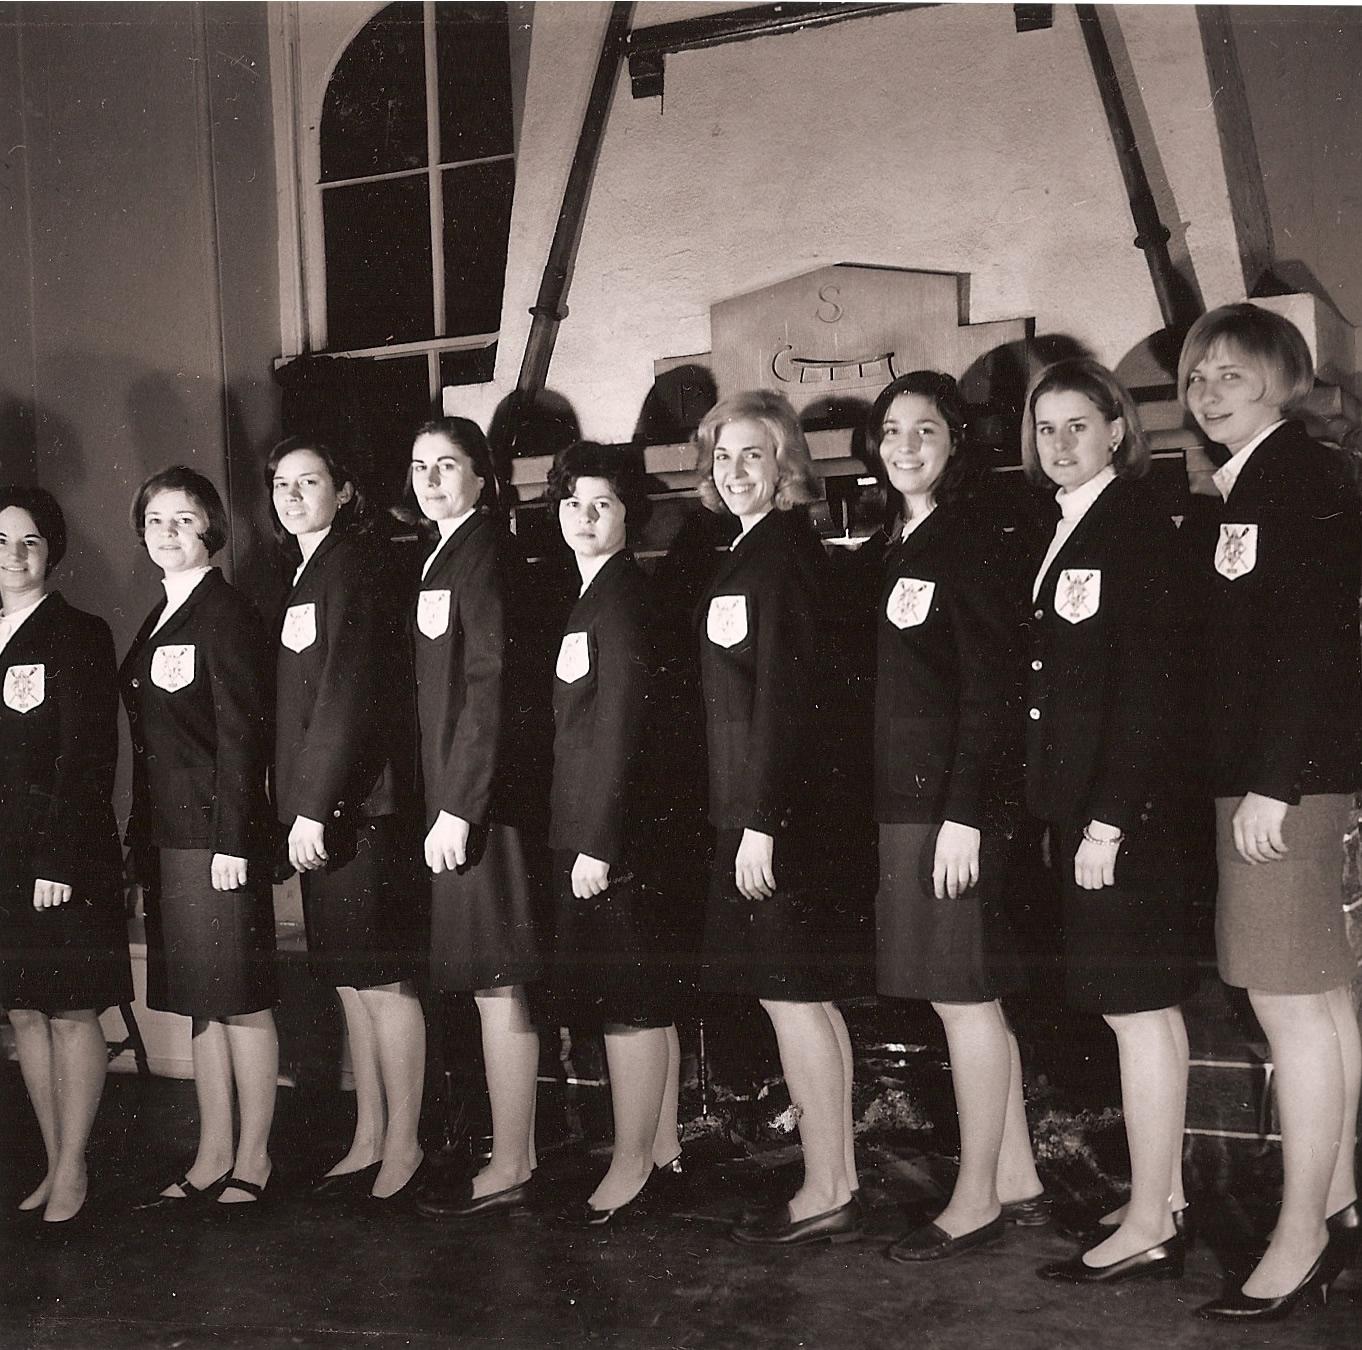 1966 National Crew  (L-R) Marjorie Pollack Ballheim, Nancy Keeler Bocchino, Barbara DePena Hoe, Faye Bardman Donovan, Evelyn Bergman, Ernestine Bayer Jr., Carol Schuler Lachal, Anita Becker Sacco, Nancy Farrell